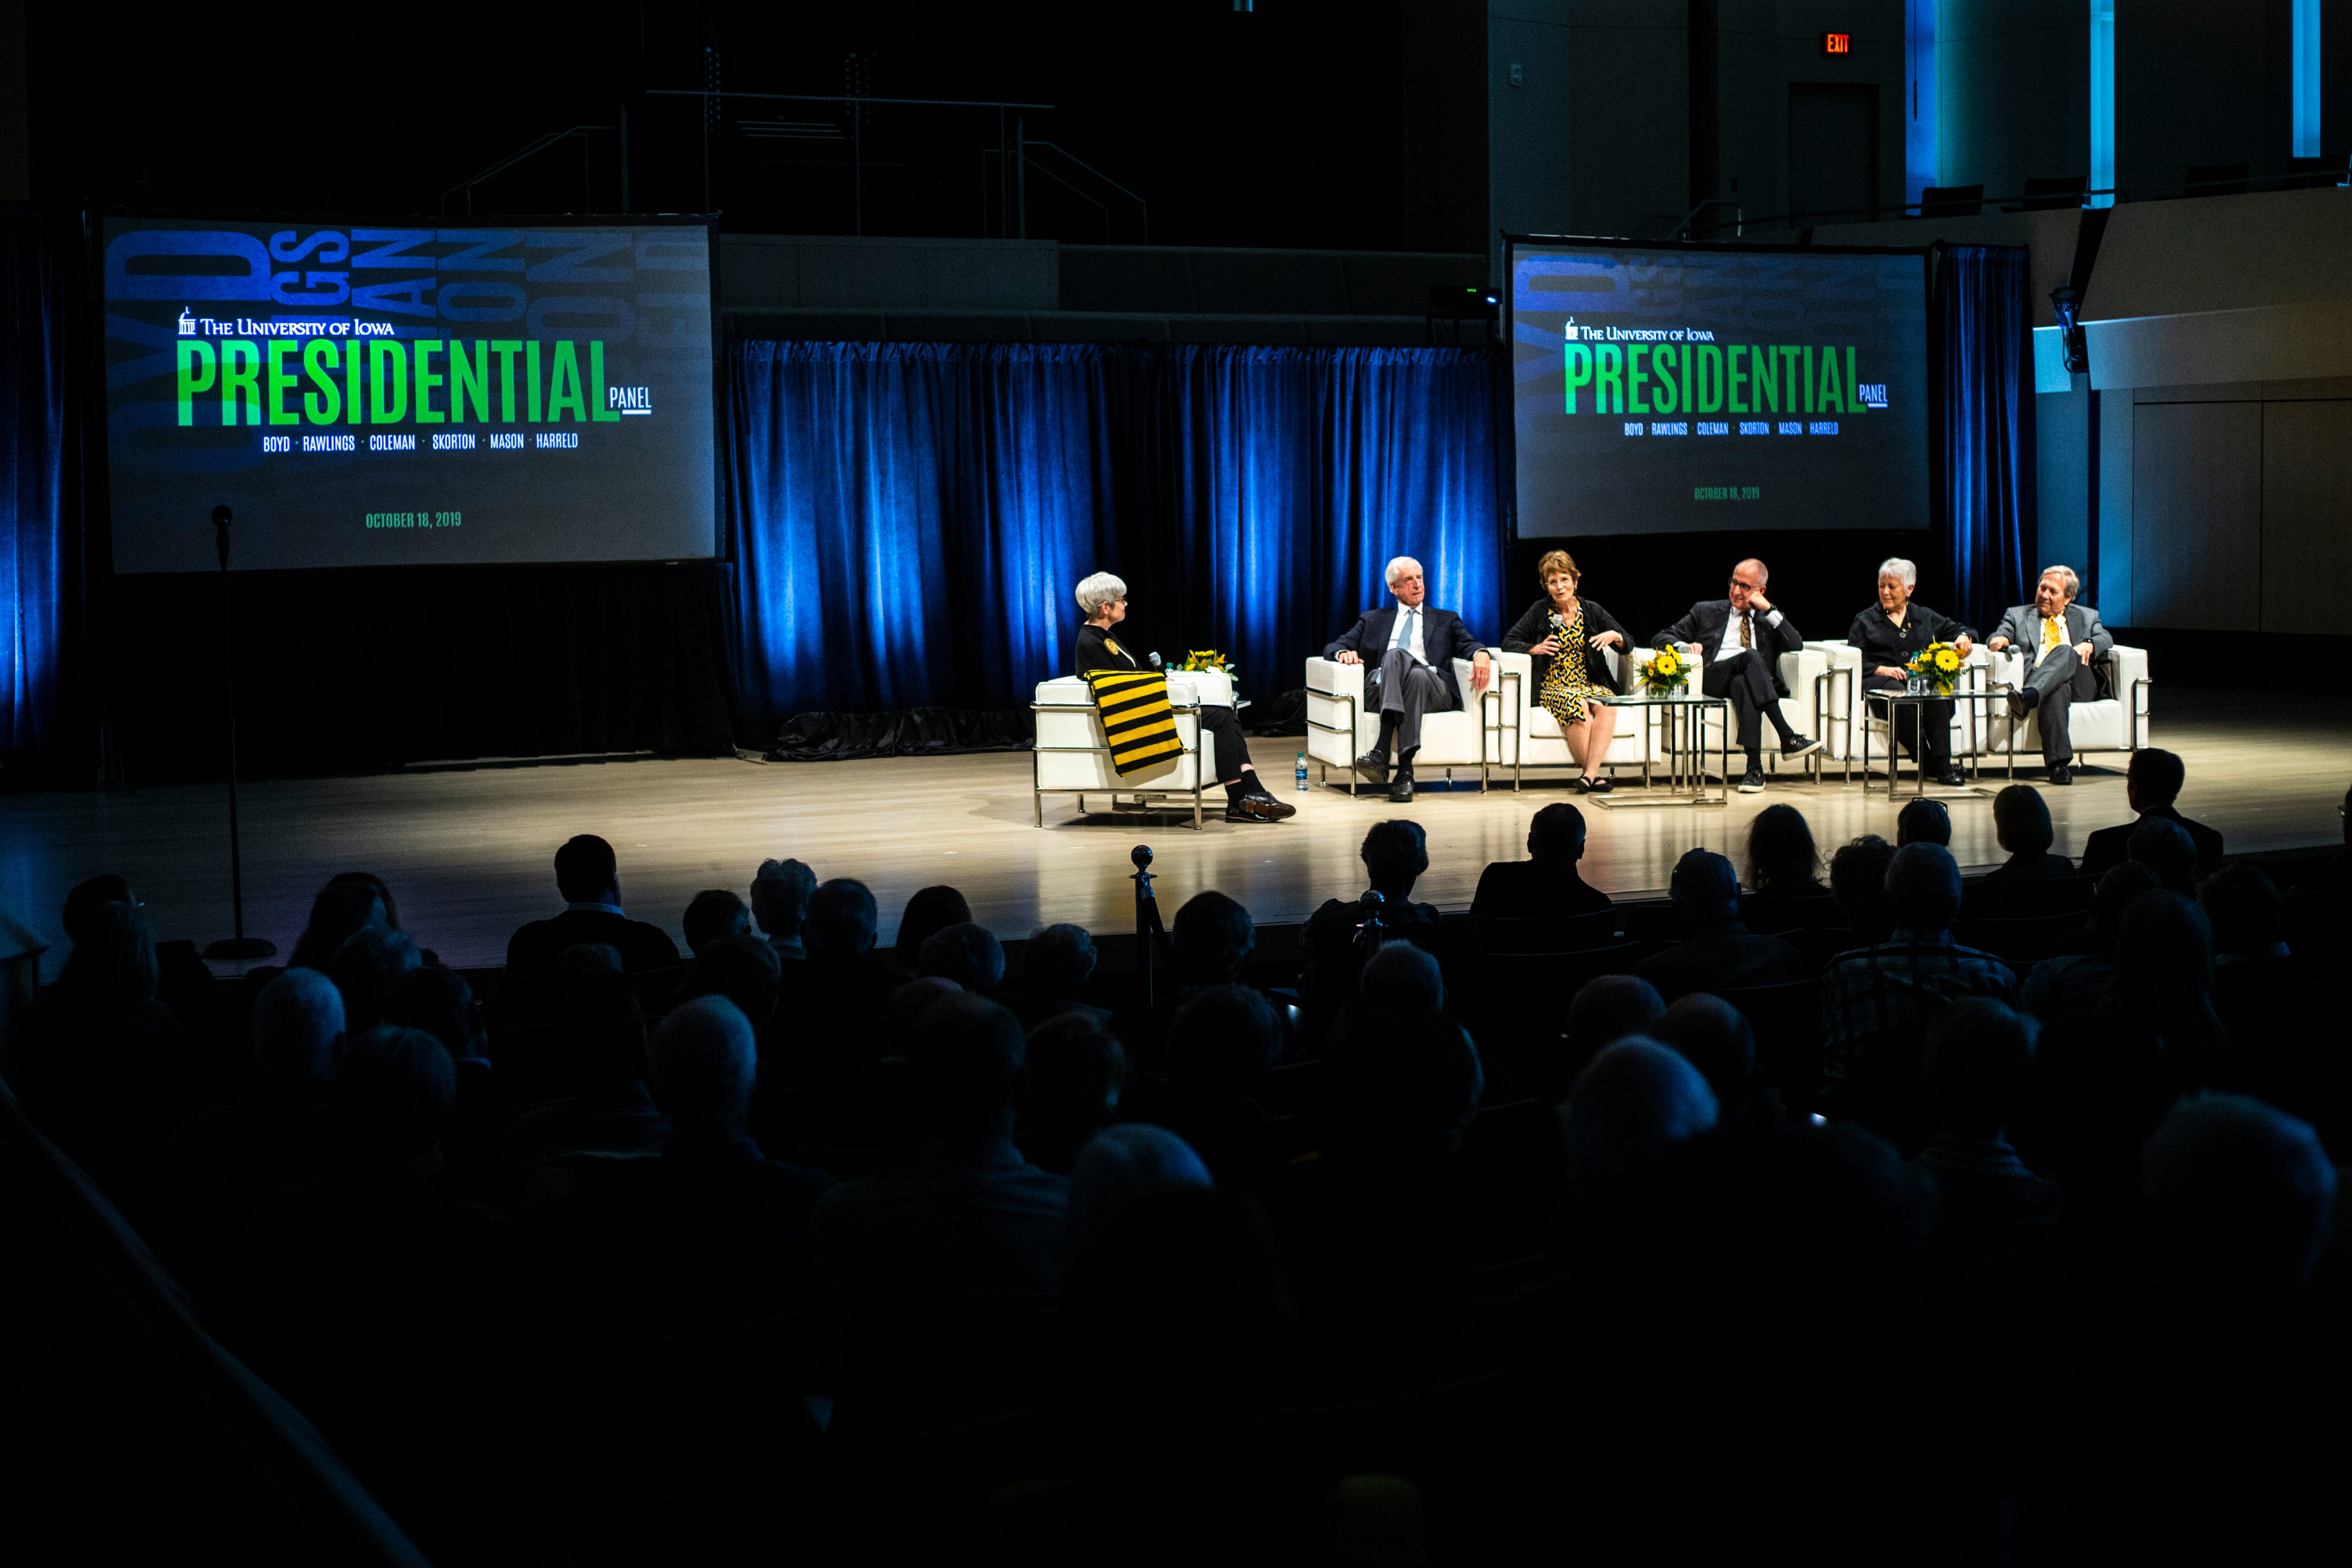 Photos: University of Iowa presidents speak at Homecoming forum